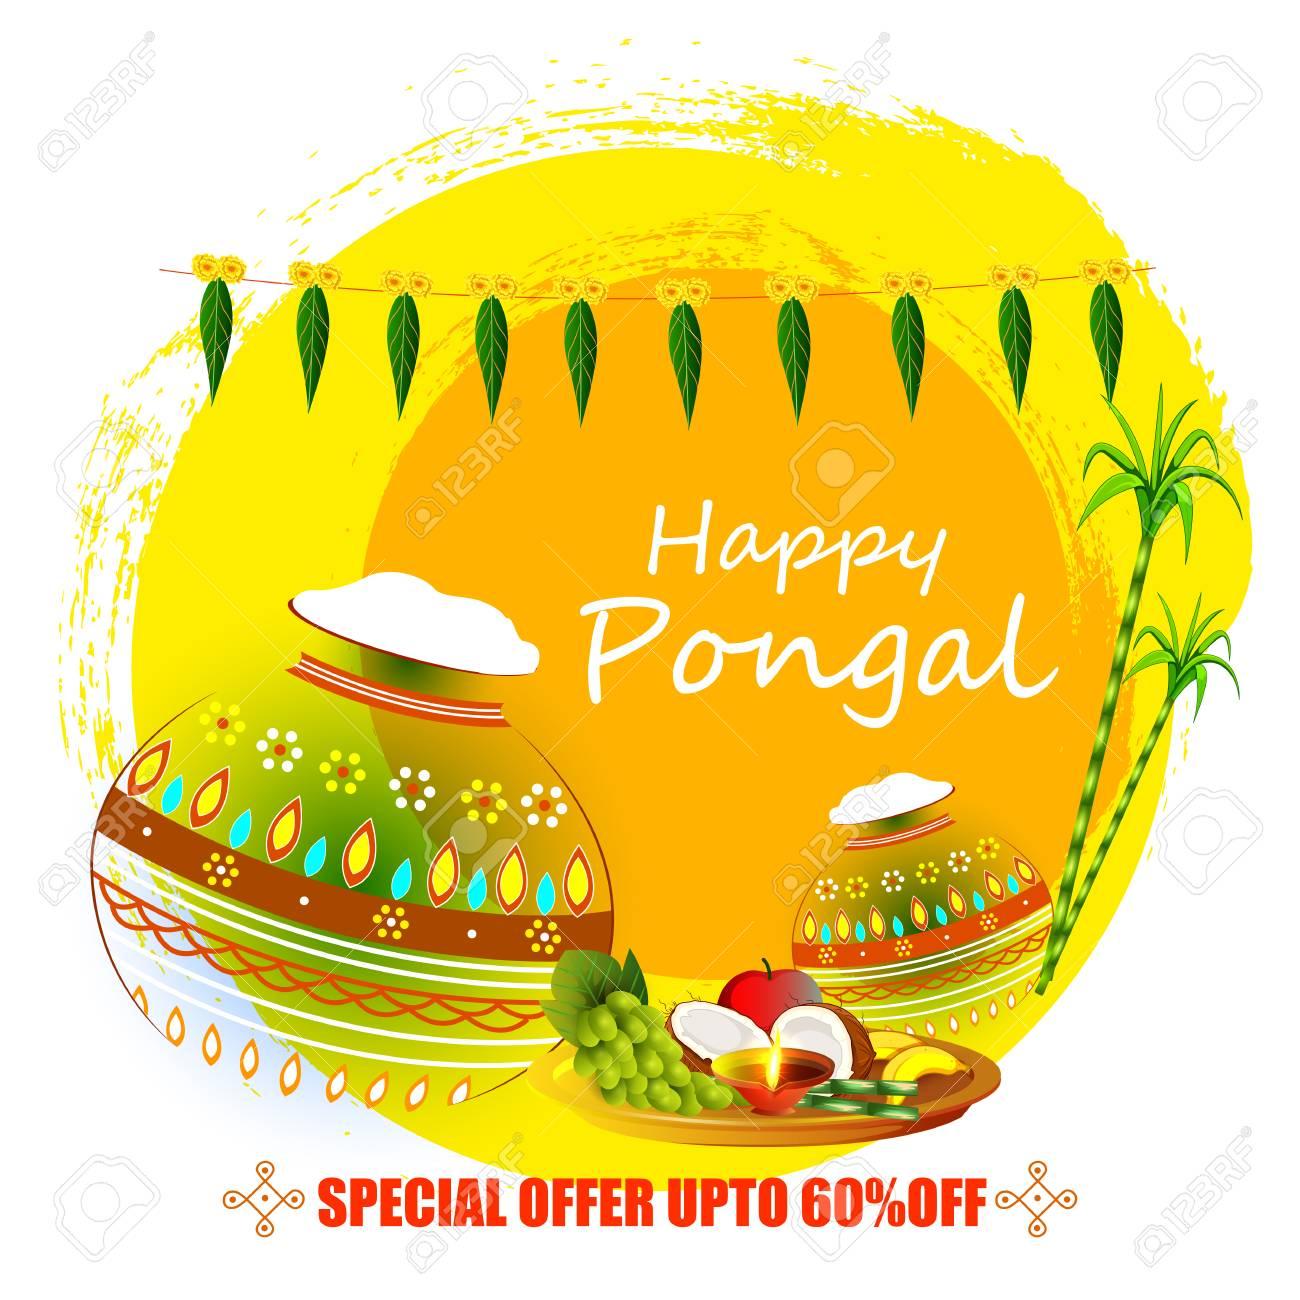 vector illustration of Happy Pongal holiday festival celebration background - 90150073